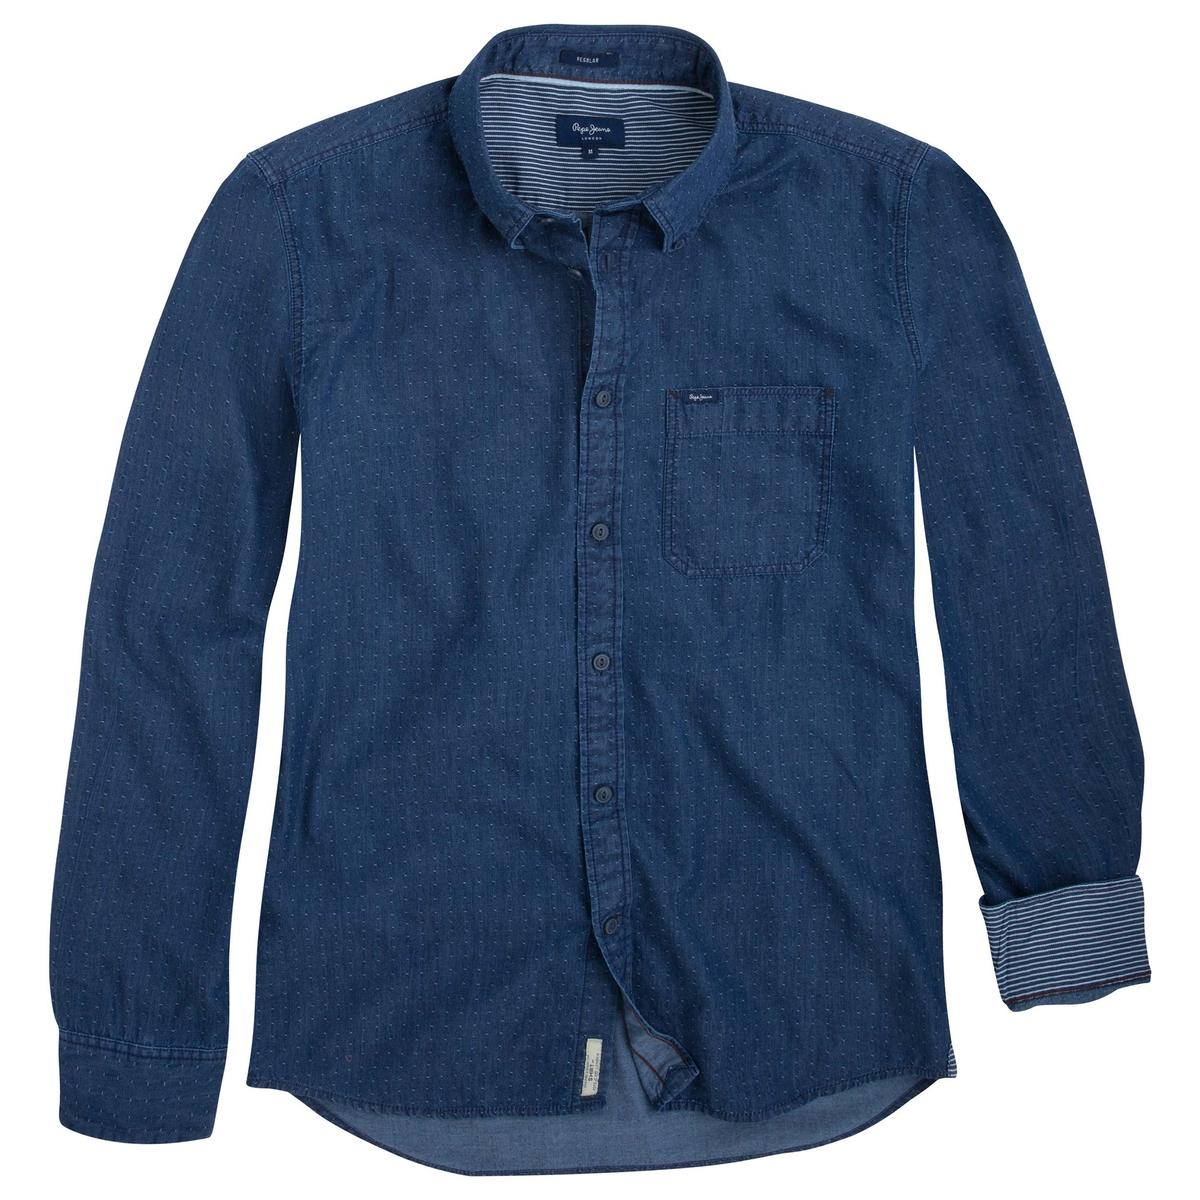 Рубашка PAGANO из денима в горошек